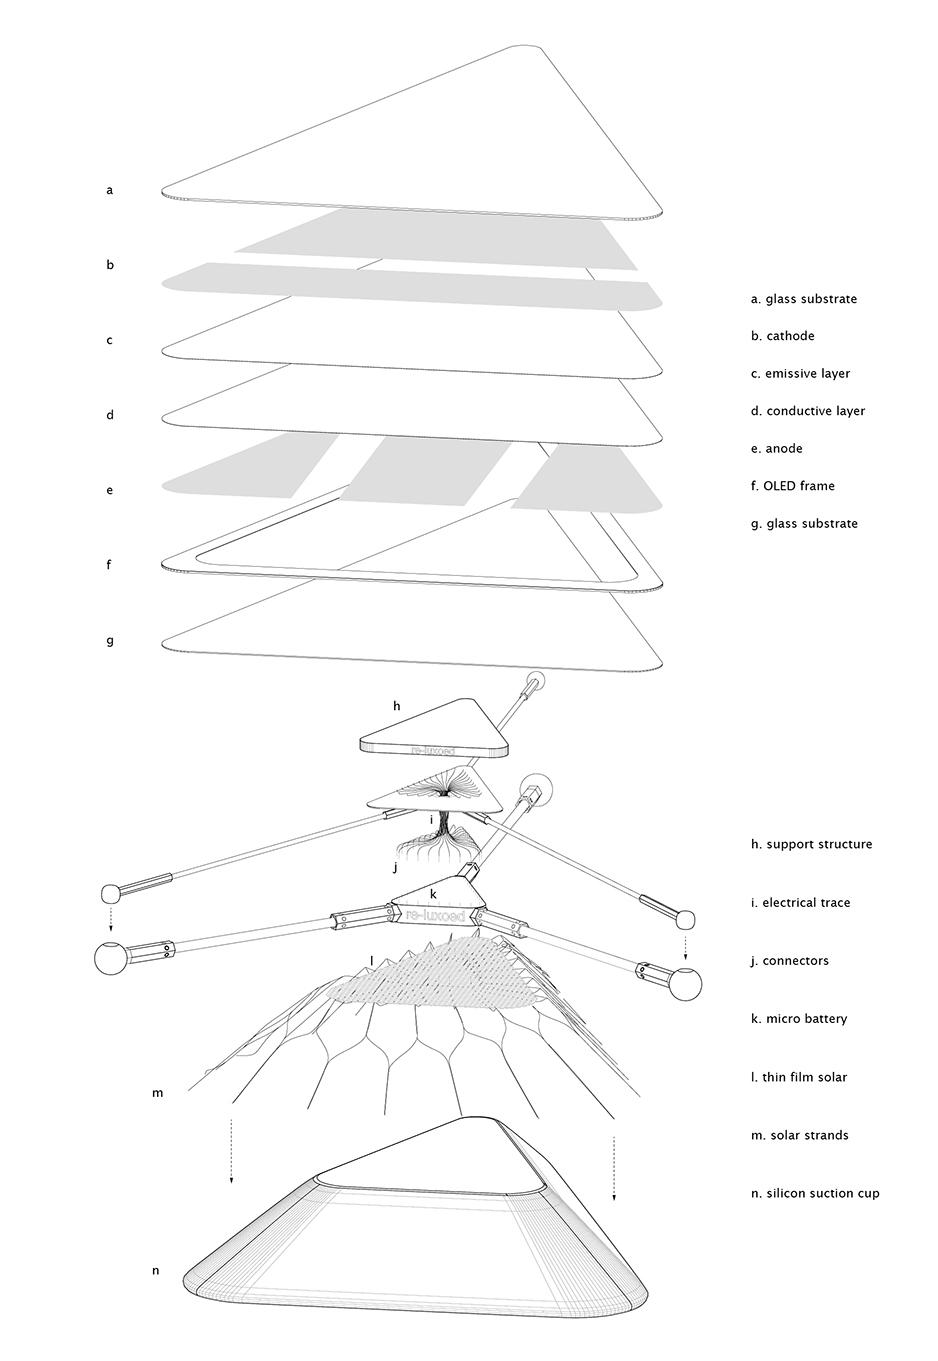 Componentry Diagram